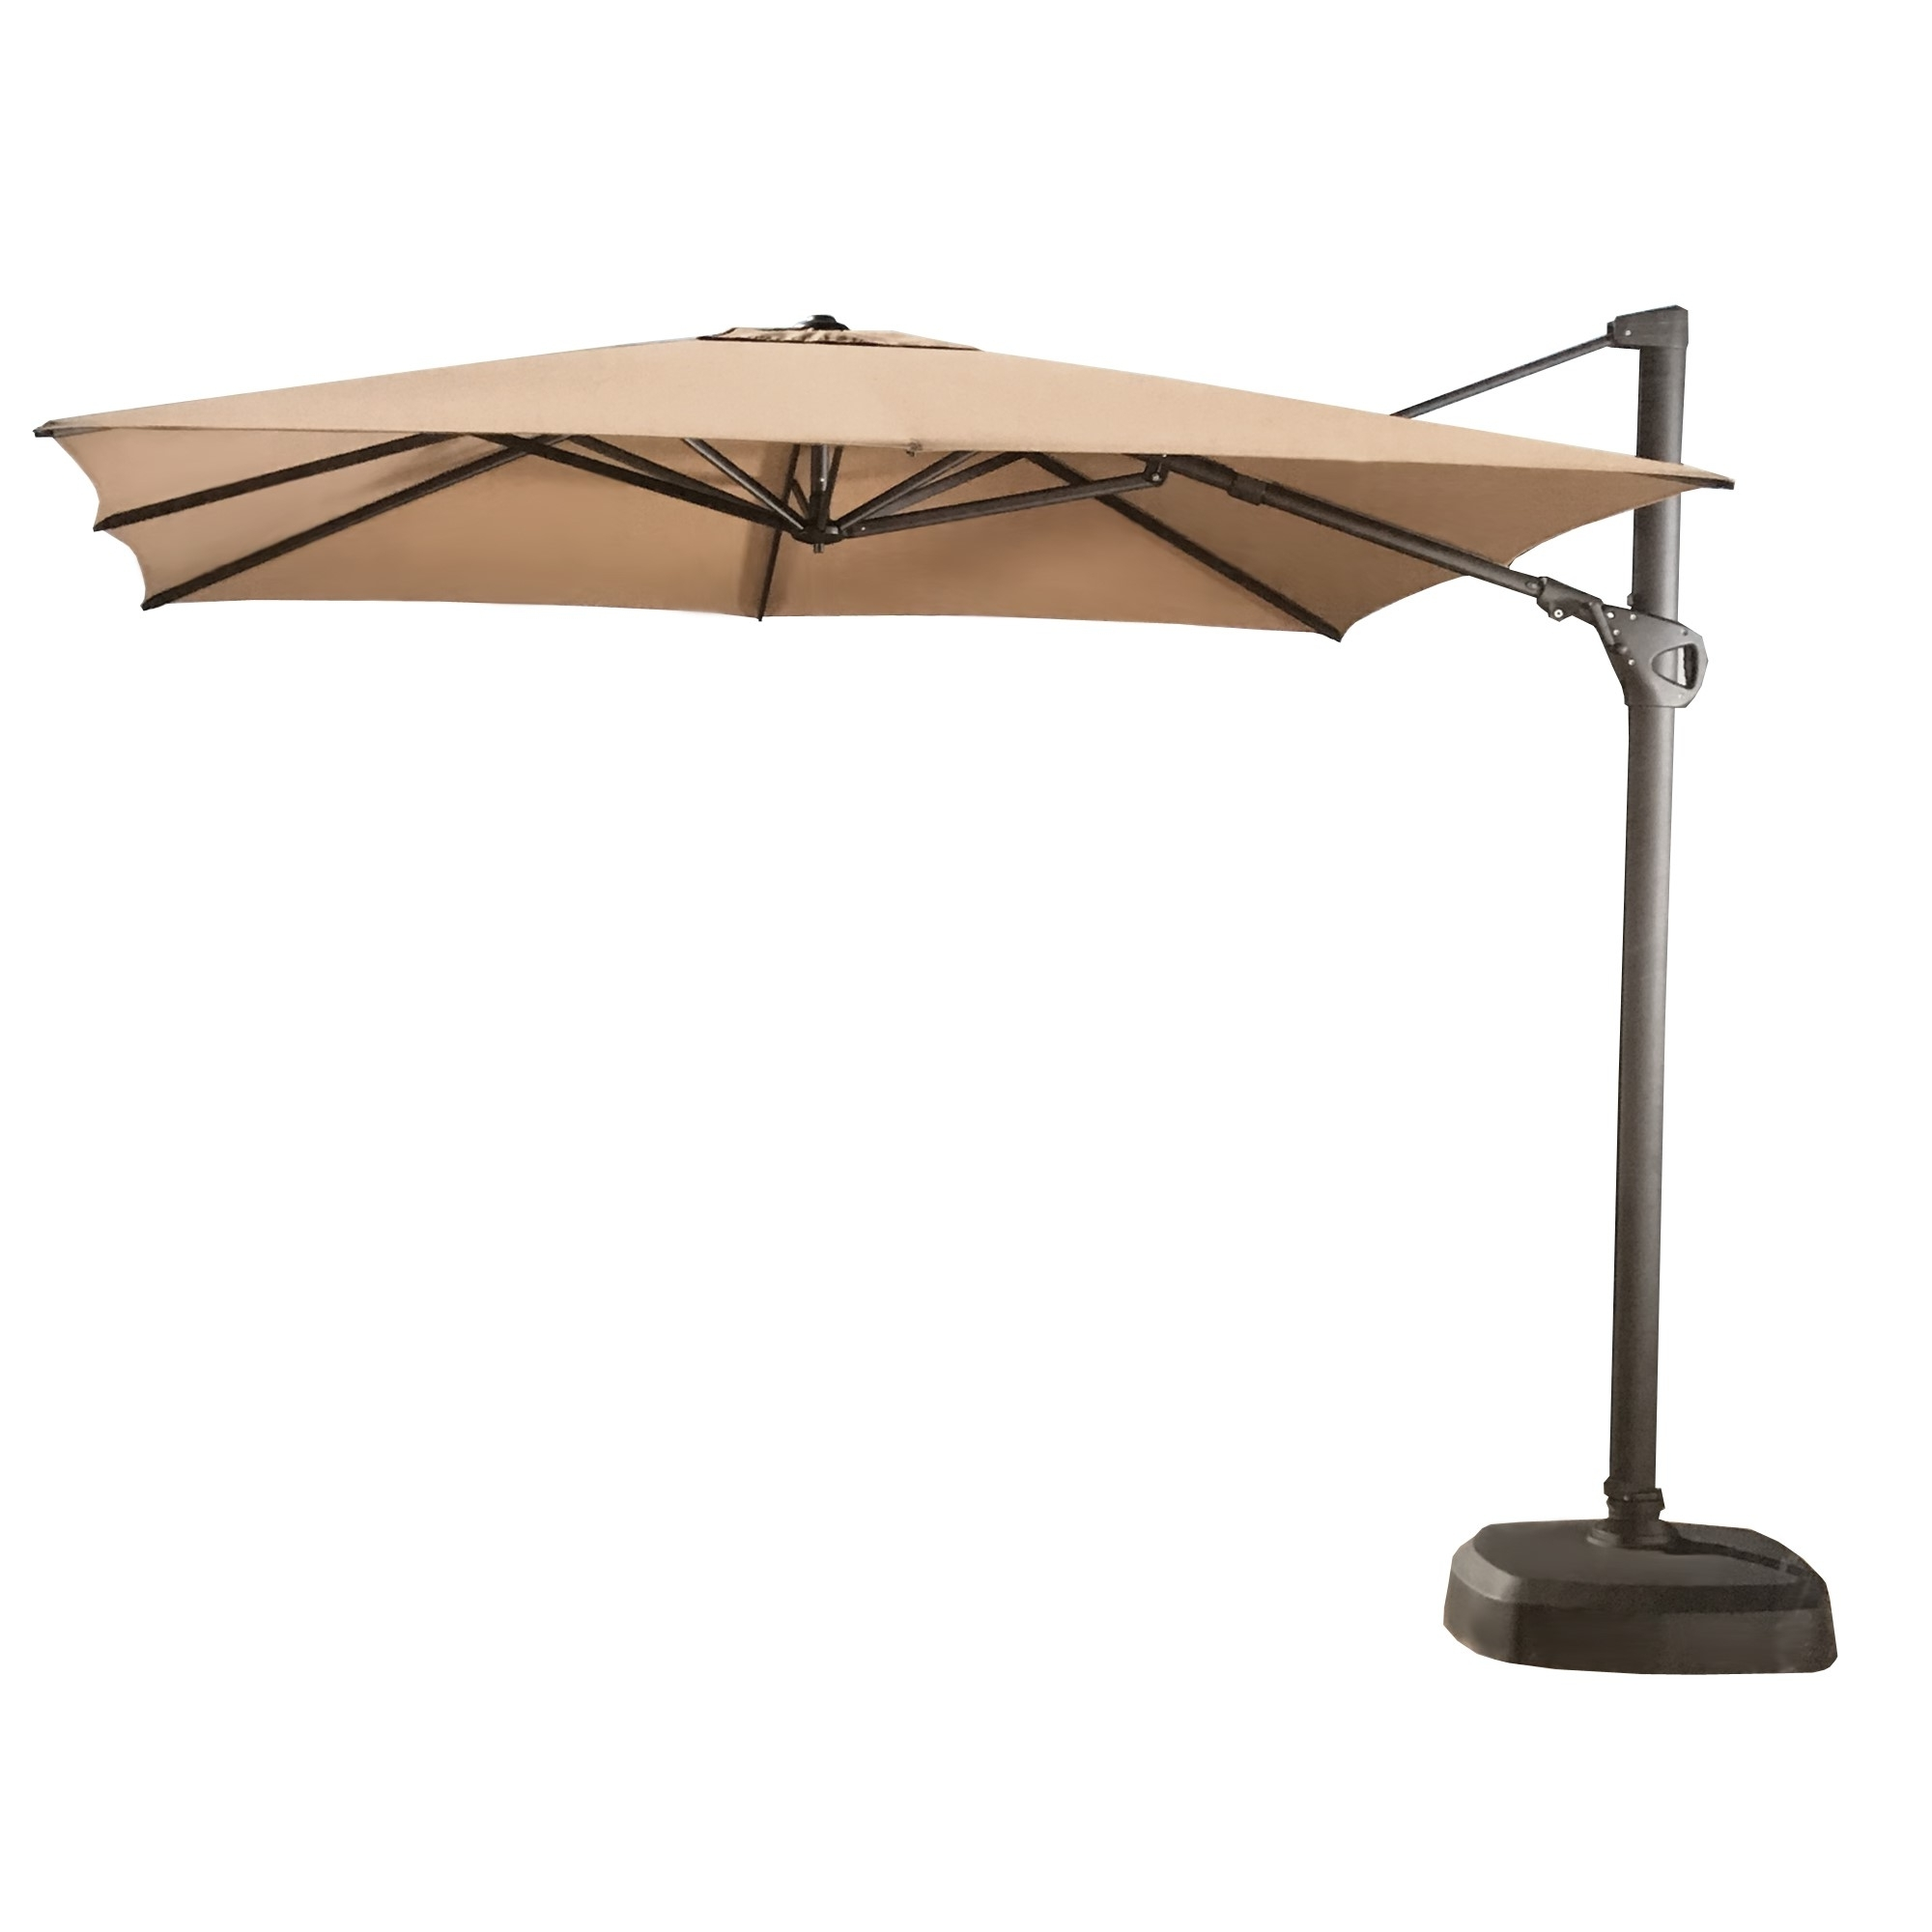 Preferred Costco Replacement Umbrella Canopy – Garden Winds Pertaining To Costco Cantilever Patio Umbrellas (View 15 of 20)